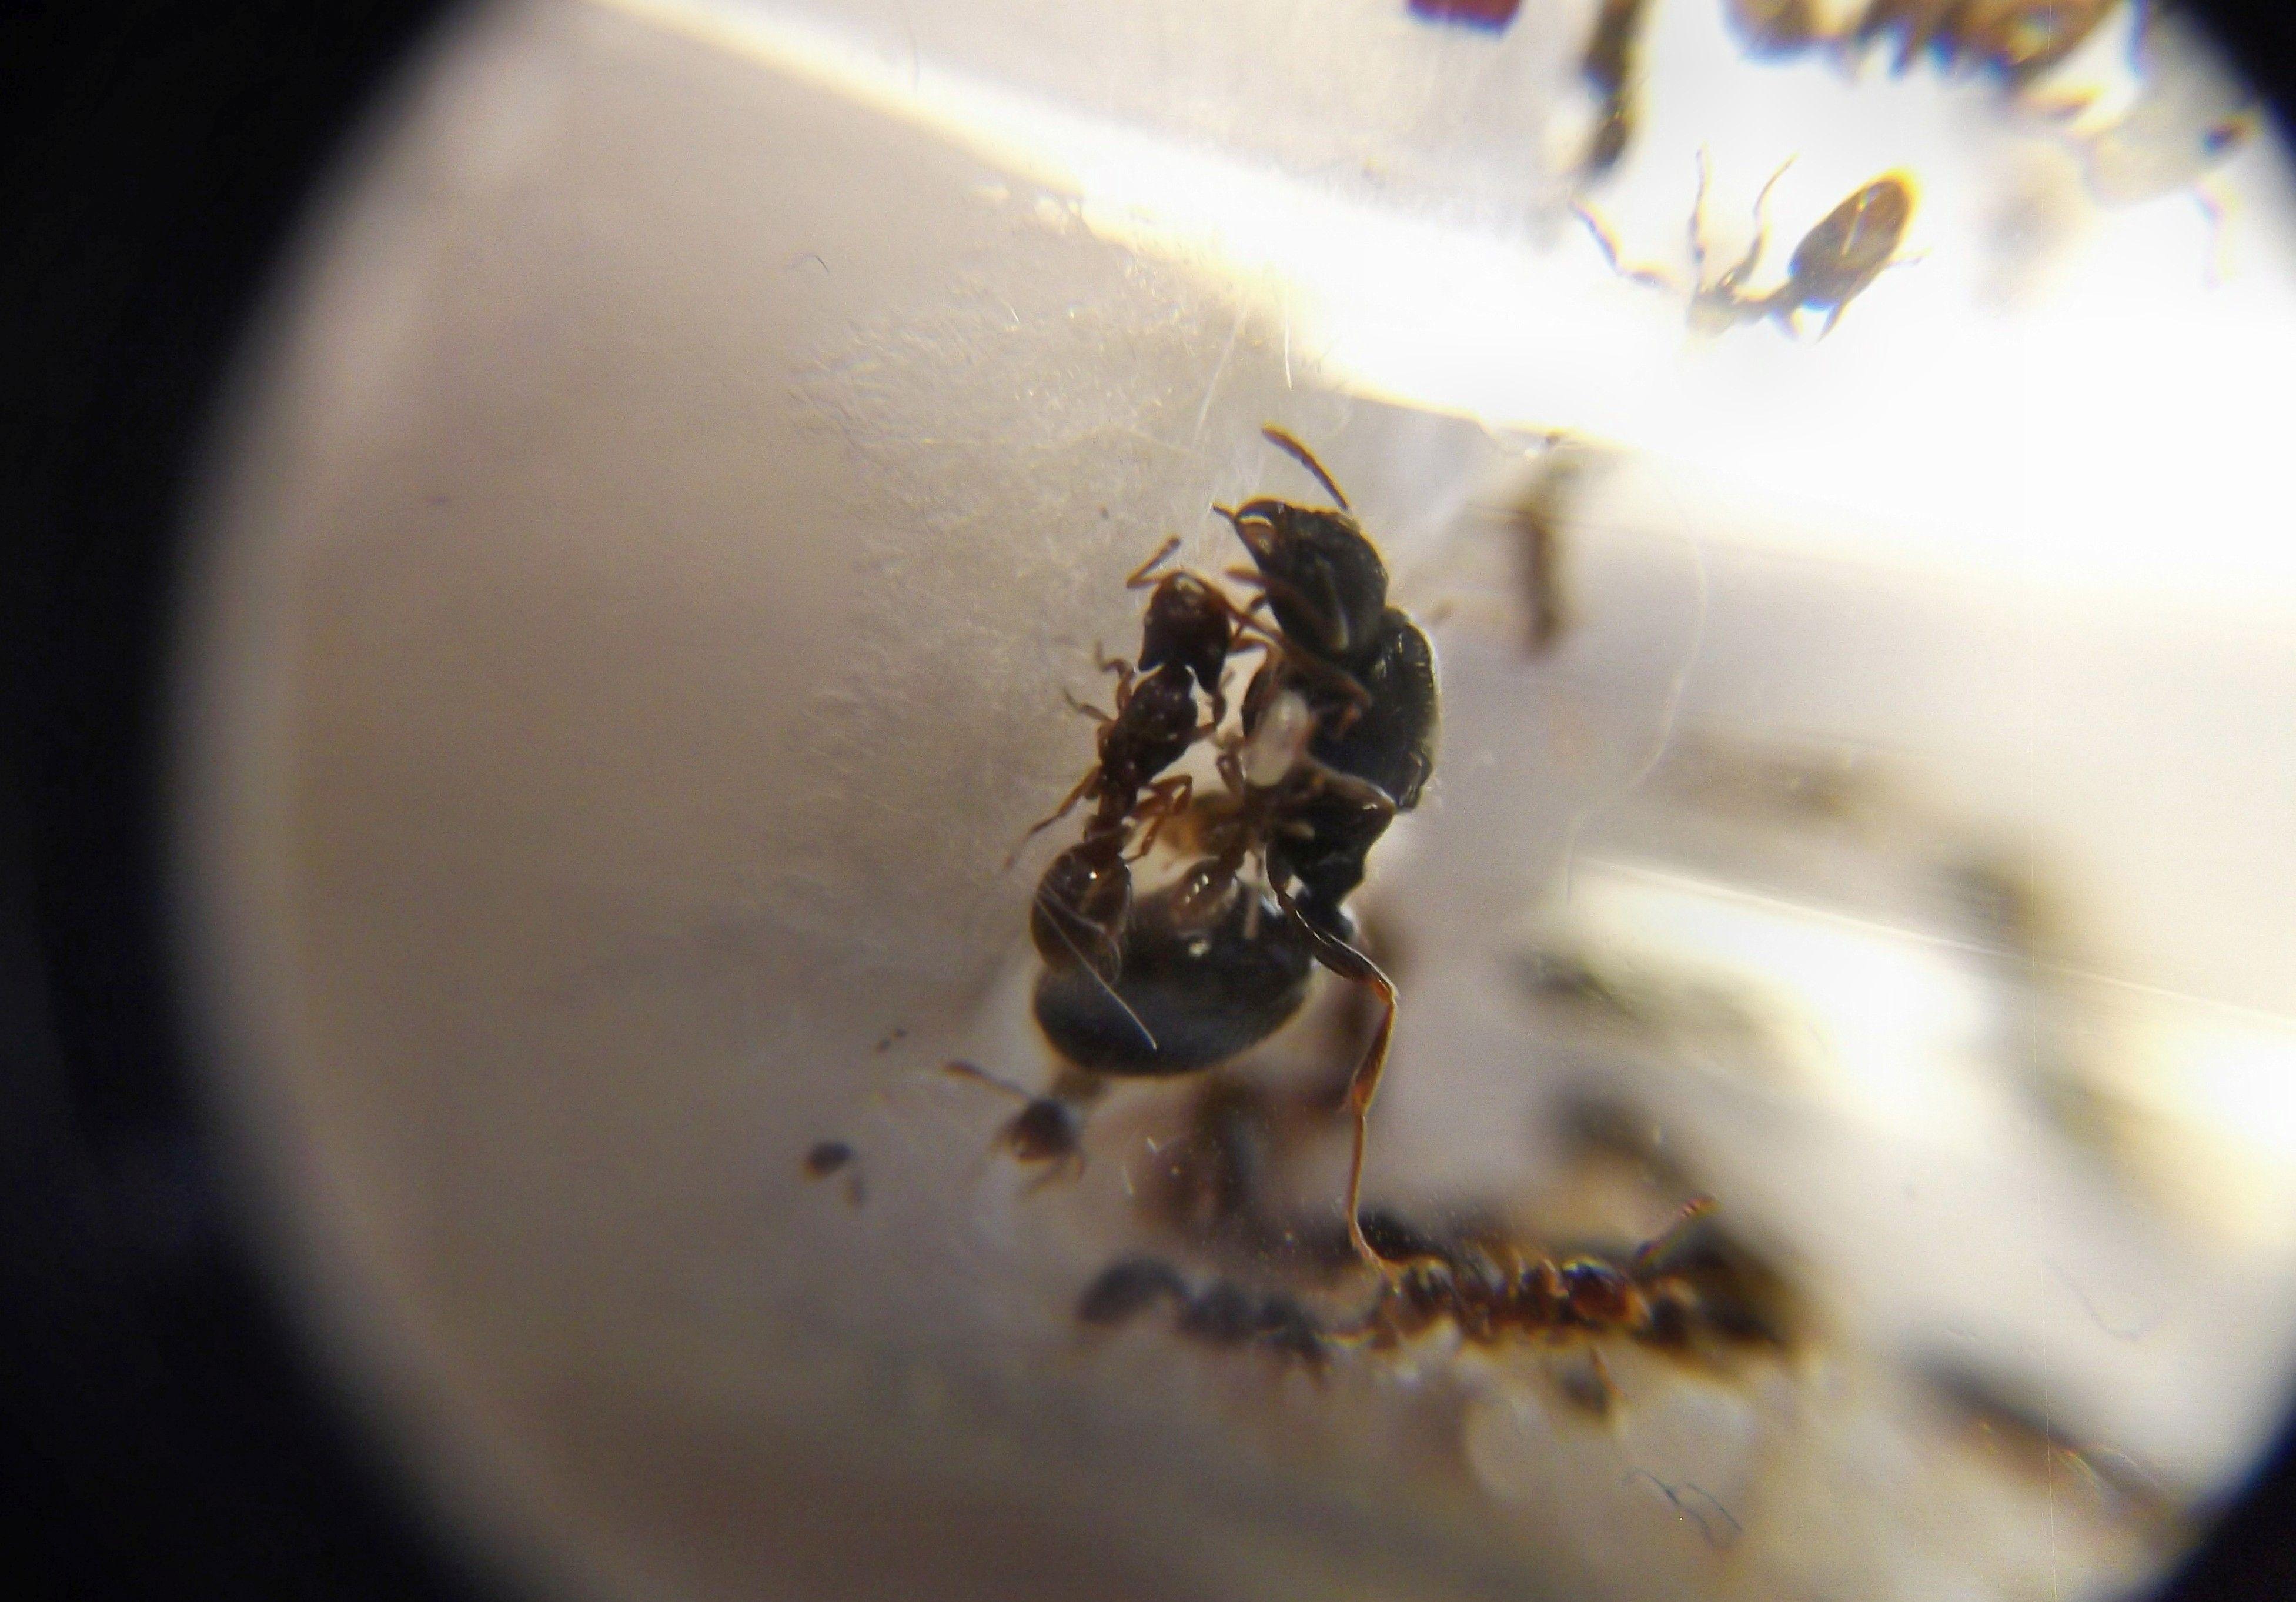 Strongylognathus testaceus i Tetramorium caespitum